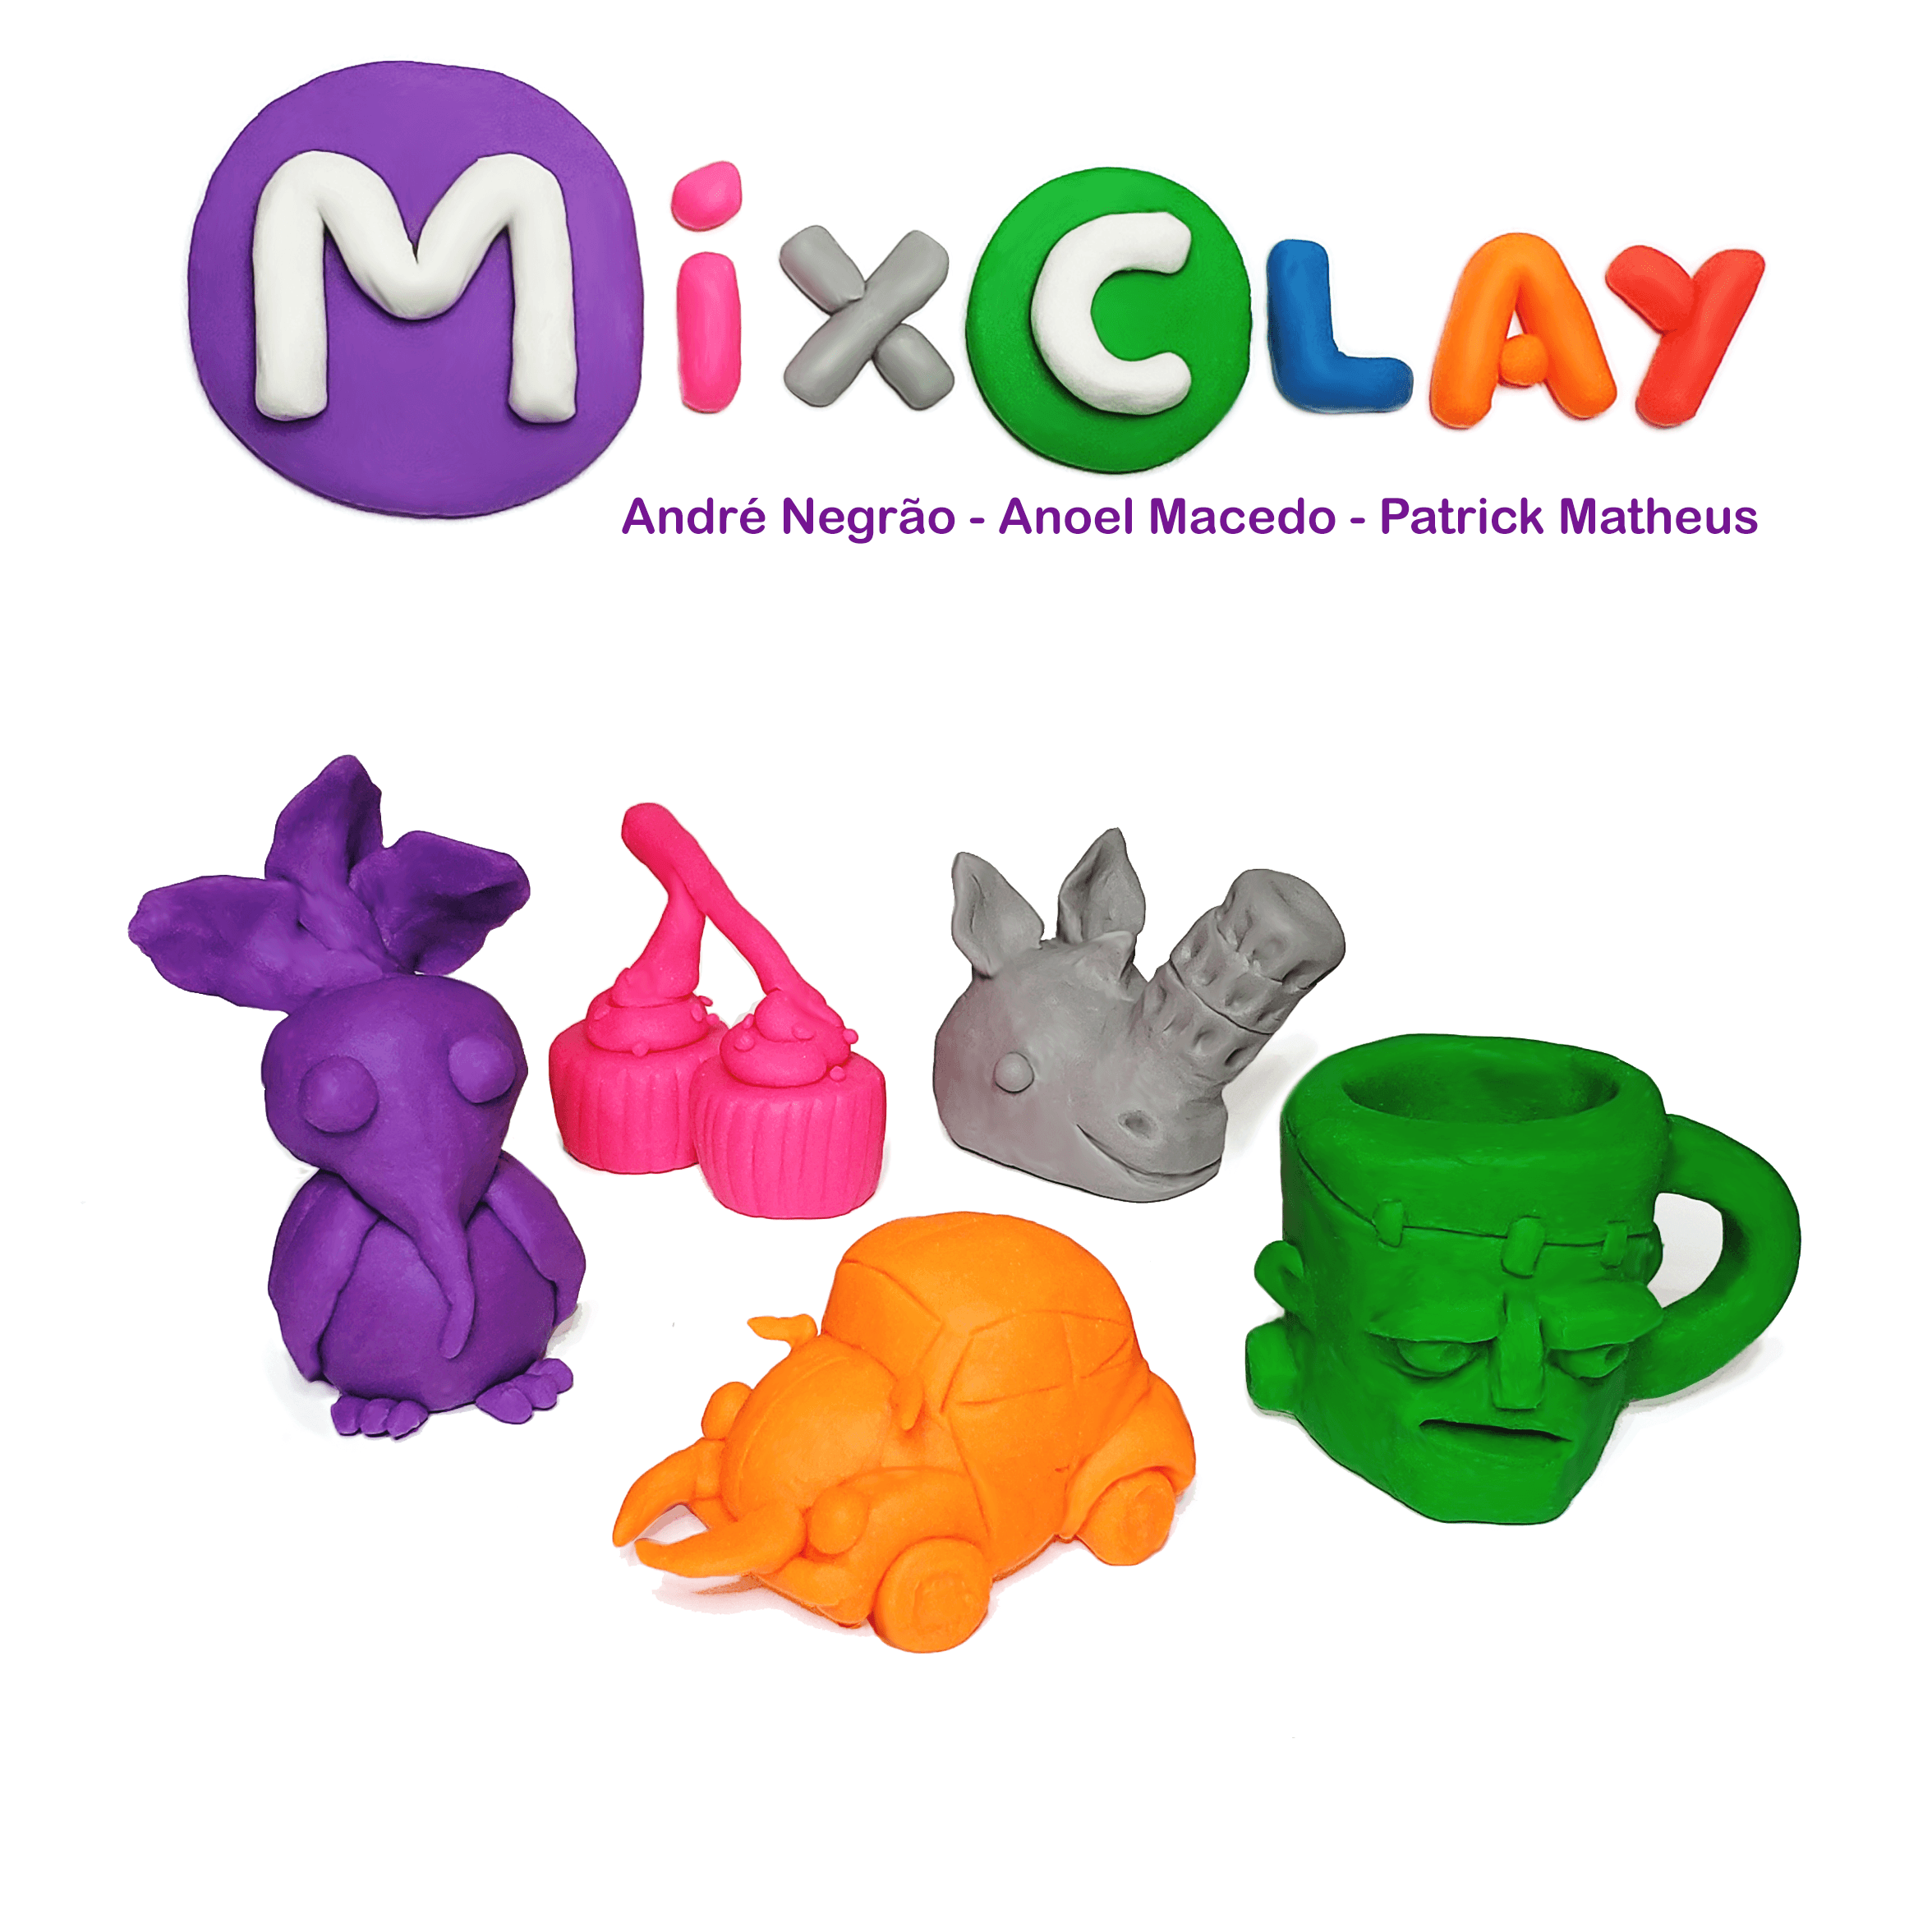 MixClay